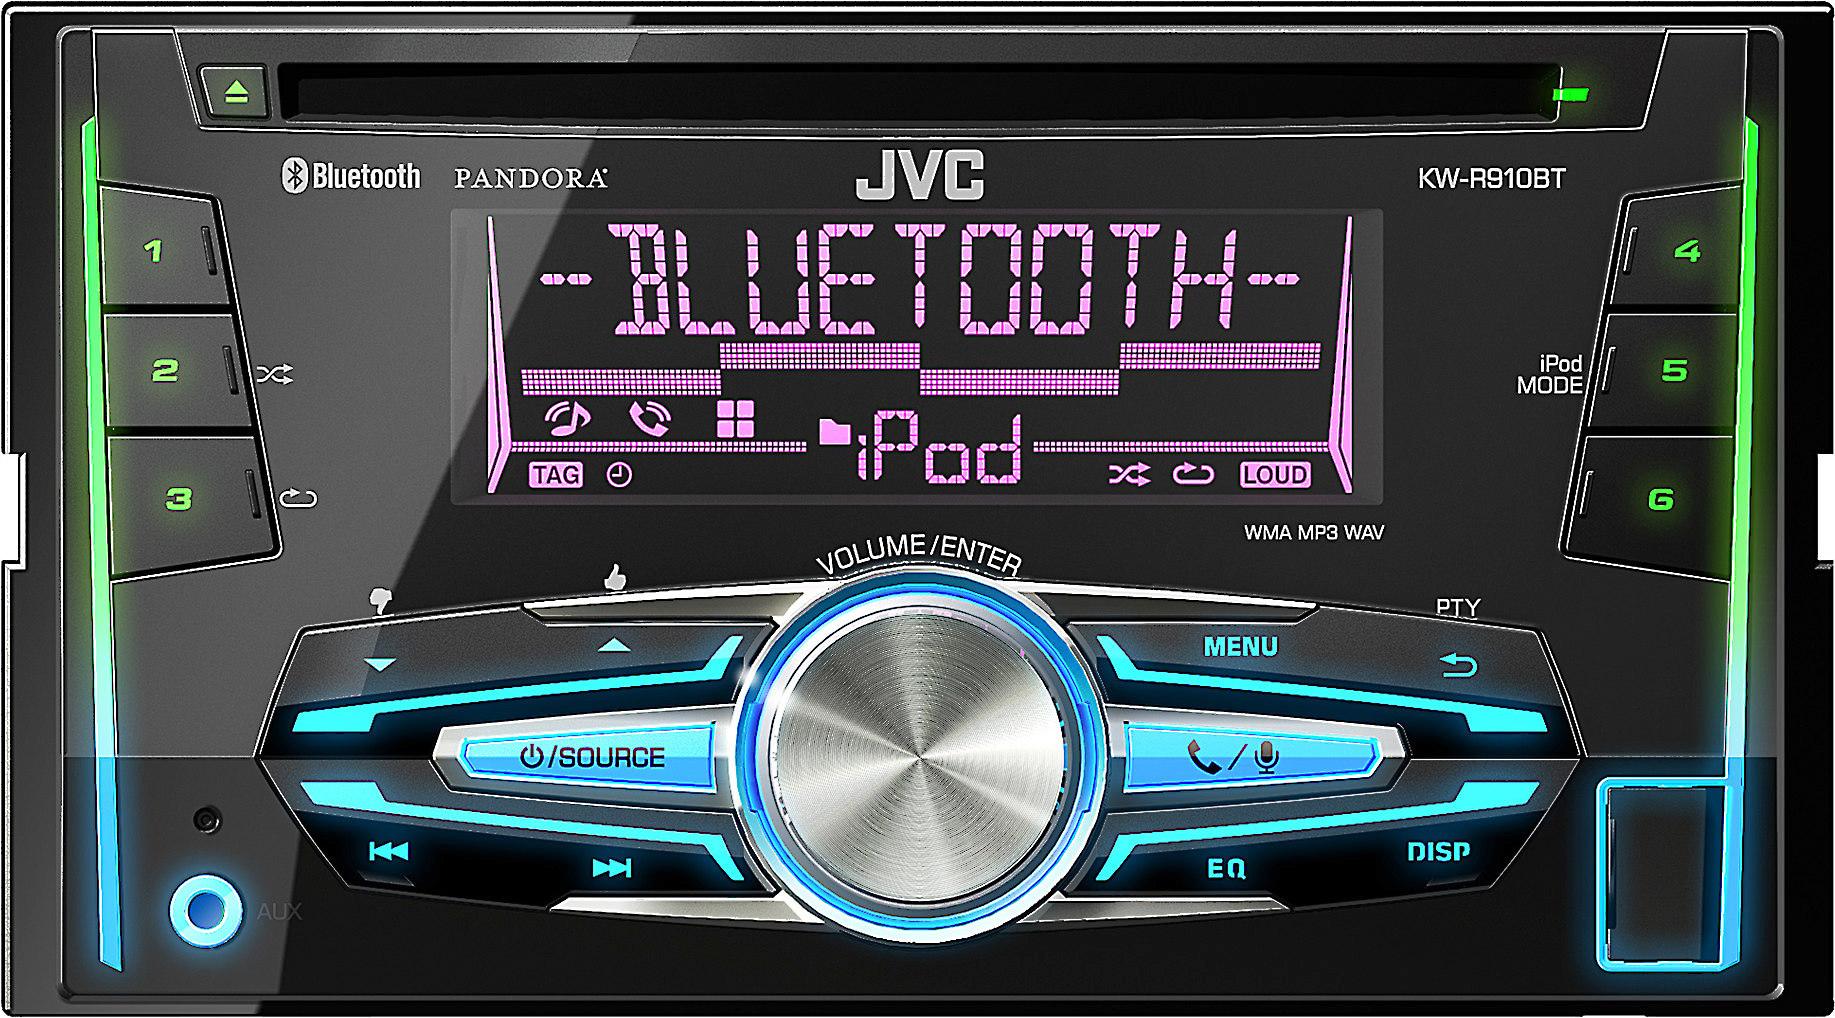 jvc kw r910bt cd receiver at crutchfield JVC KW- R500